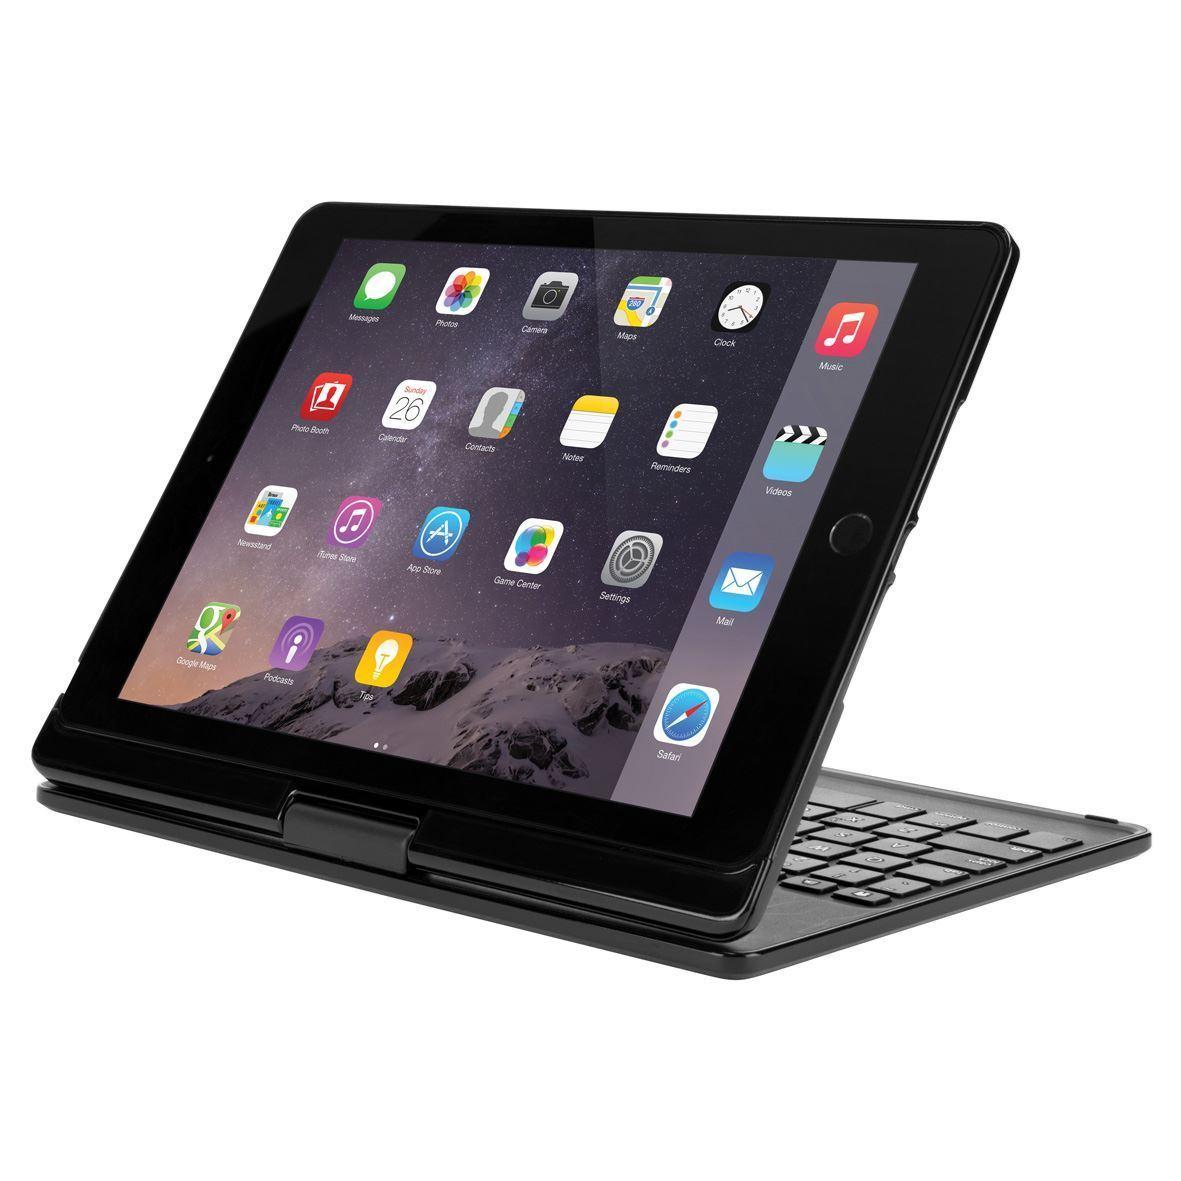 versatype tui clavier azerty pour ipad air 2 noir. Black Bedroom Furniture Sets. Home Design Ideas